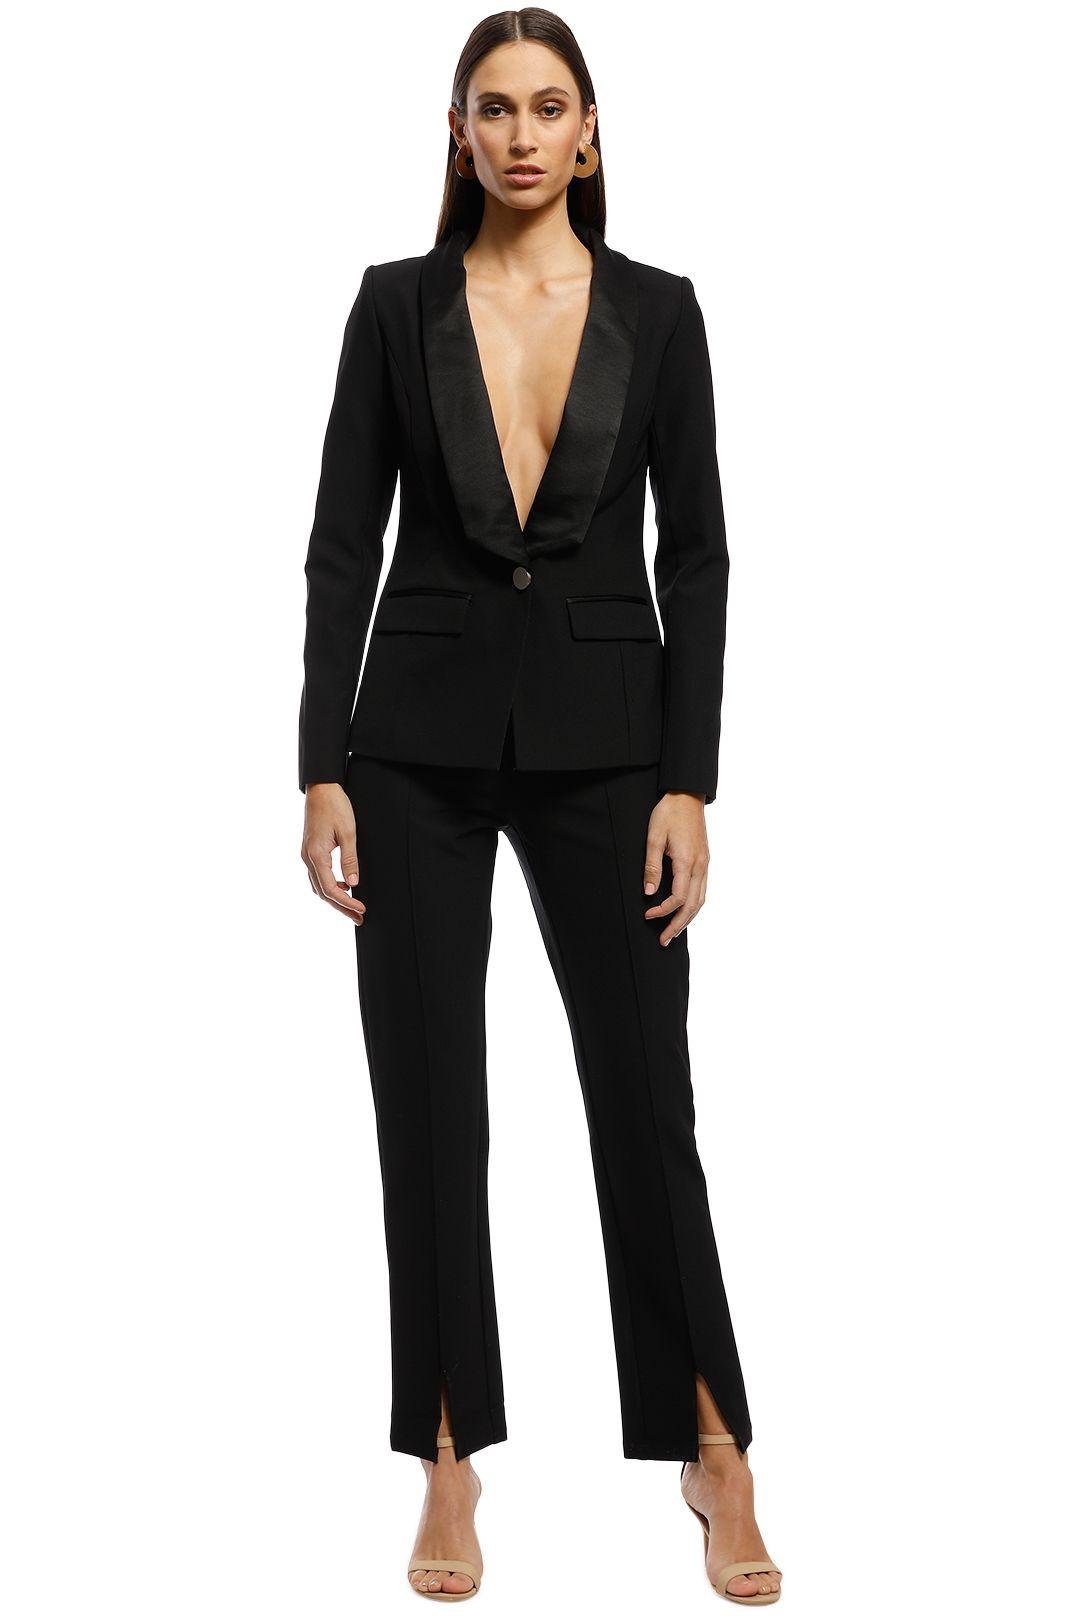 Bianca & Bridgett - Milan Blazer and Pants - Black - Front